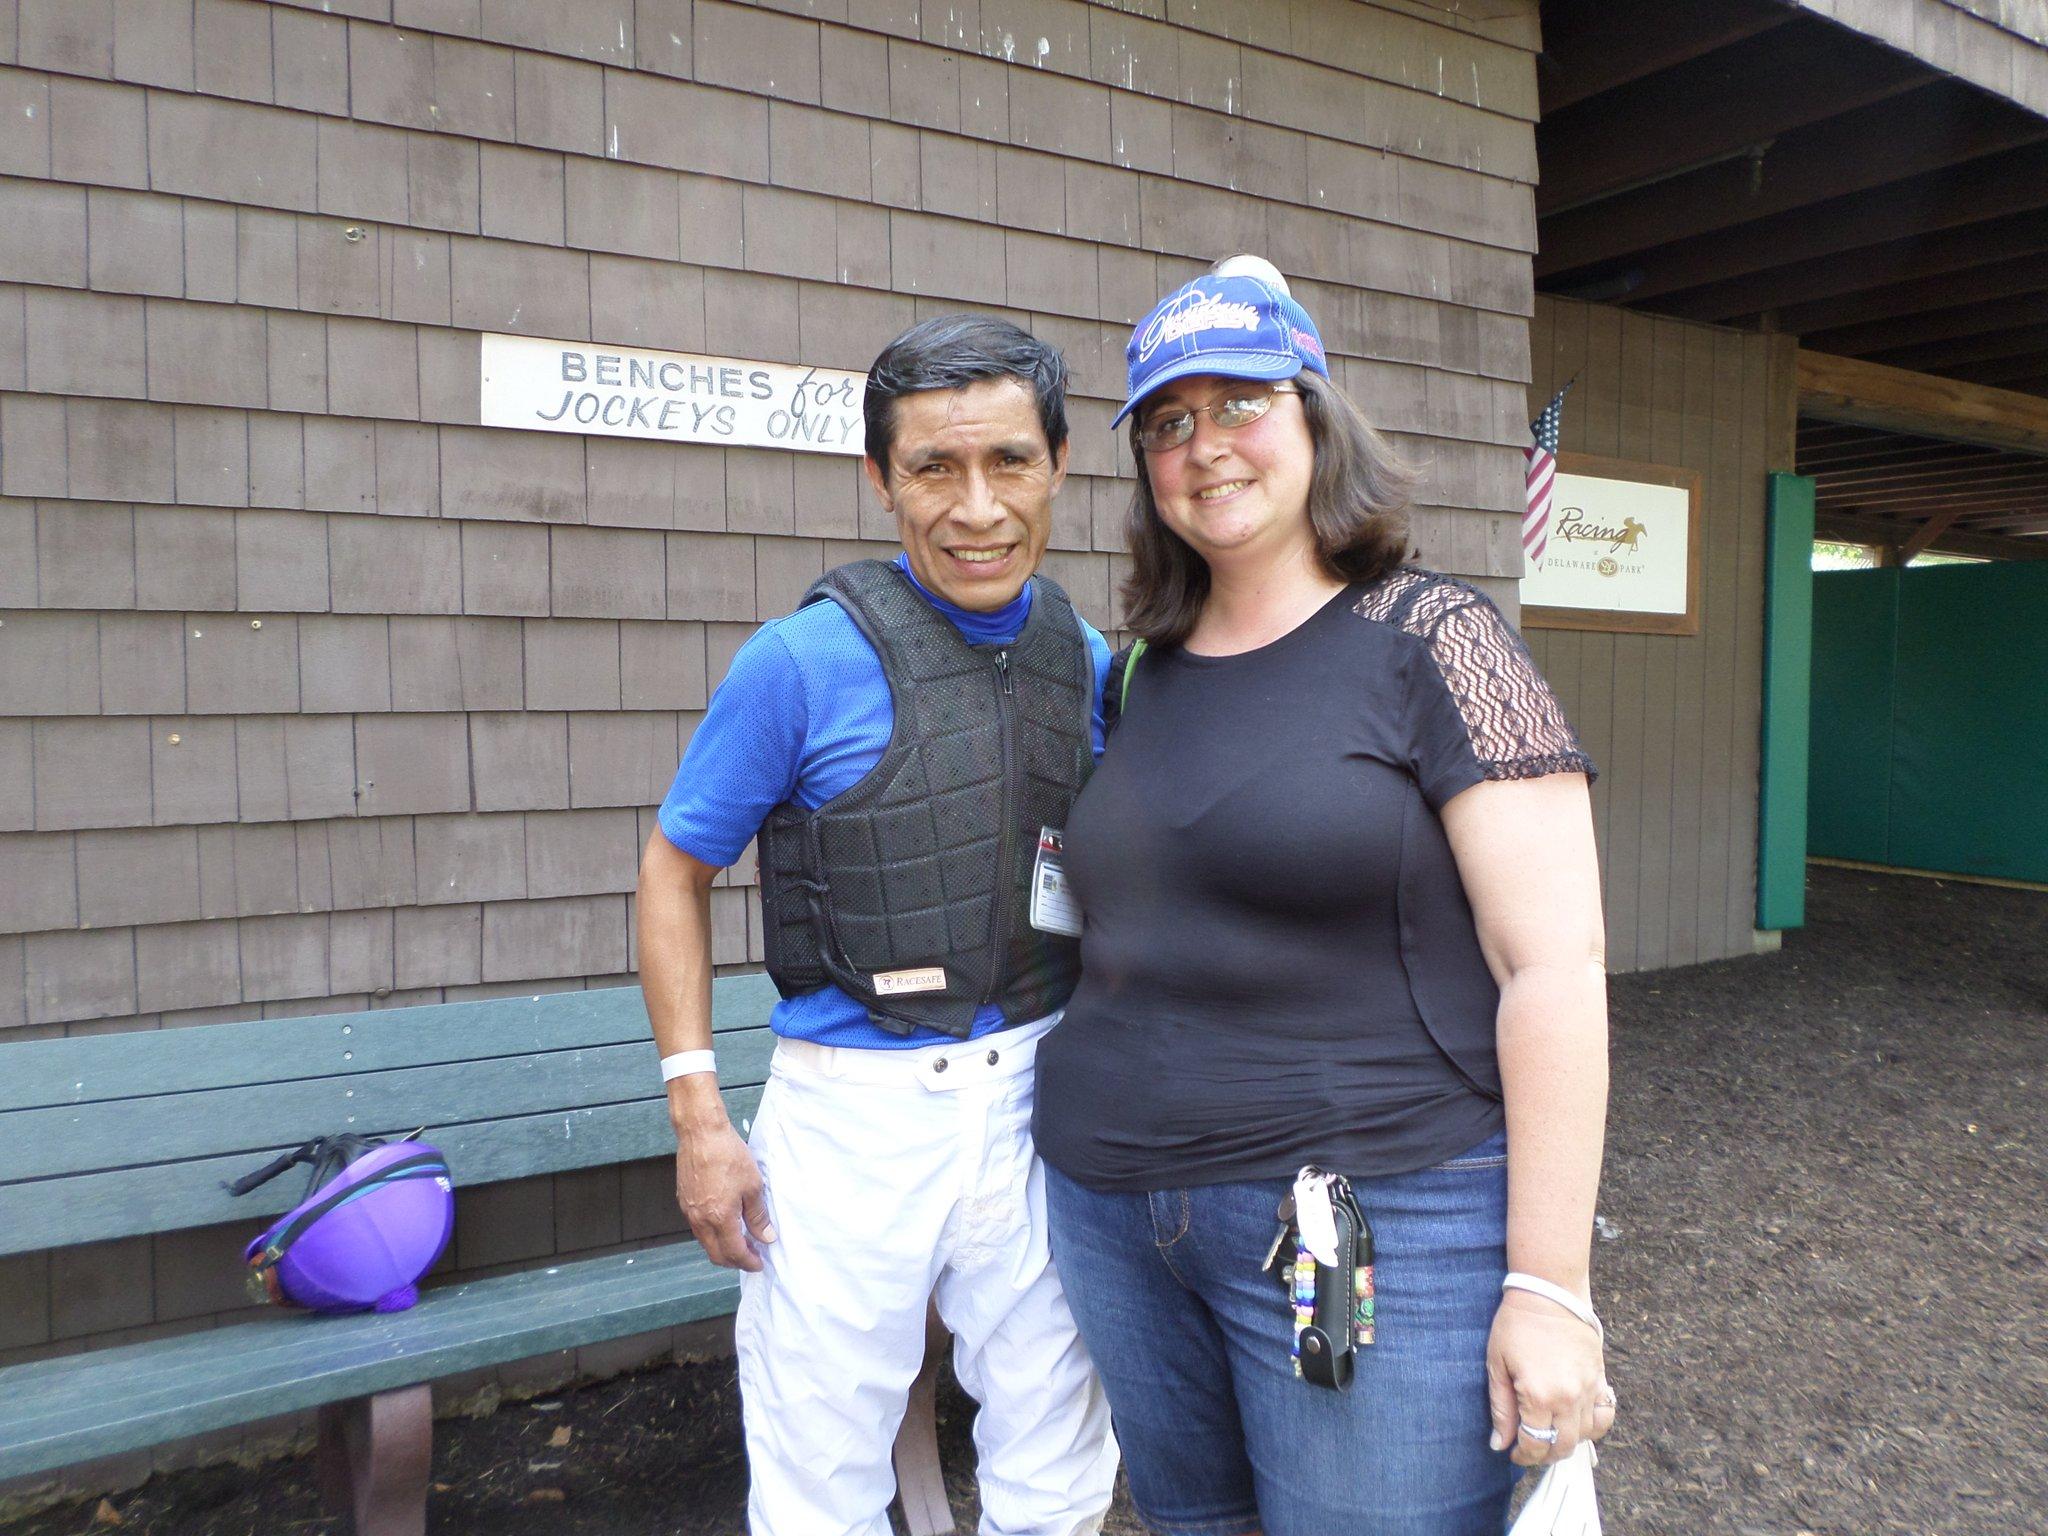 Happy birthday to one of my favorite jockeys of all time Edgar Prado!